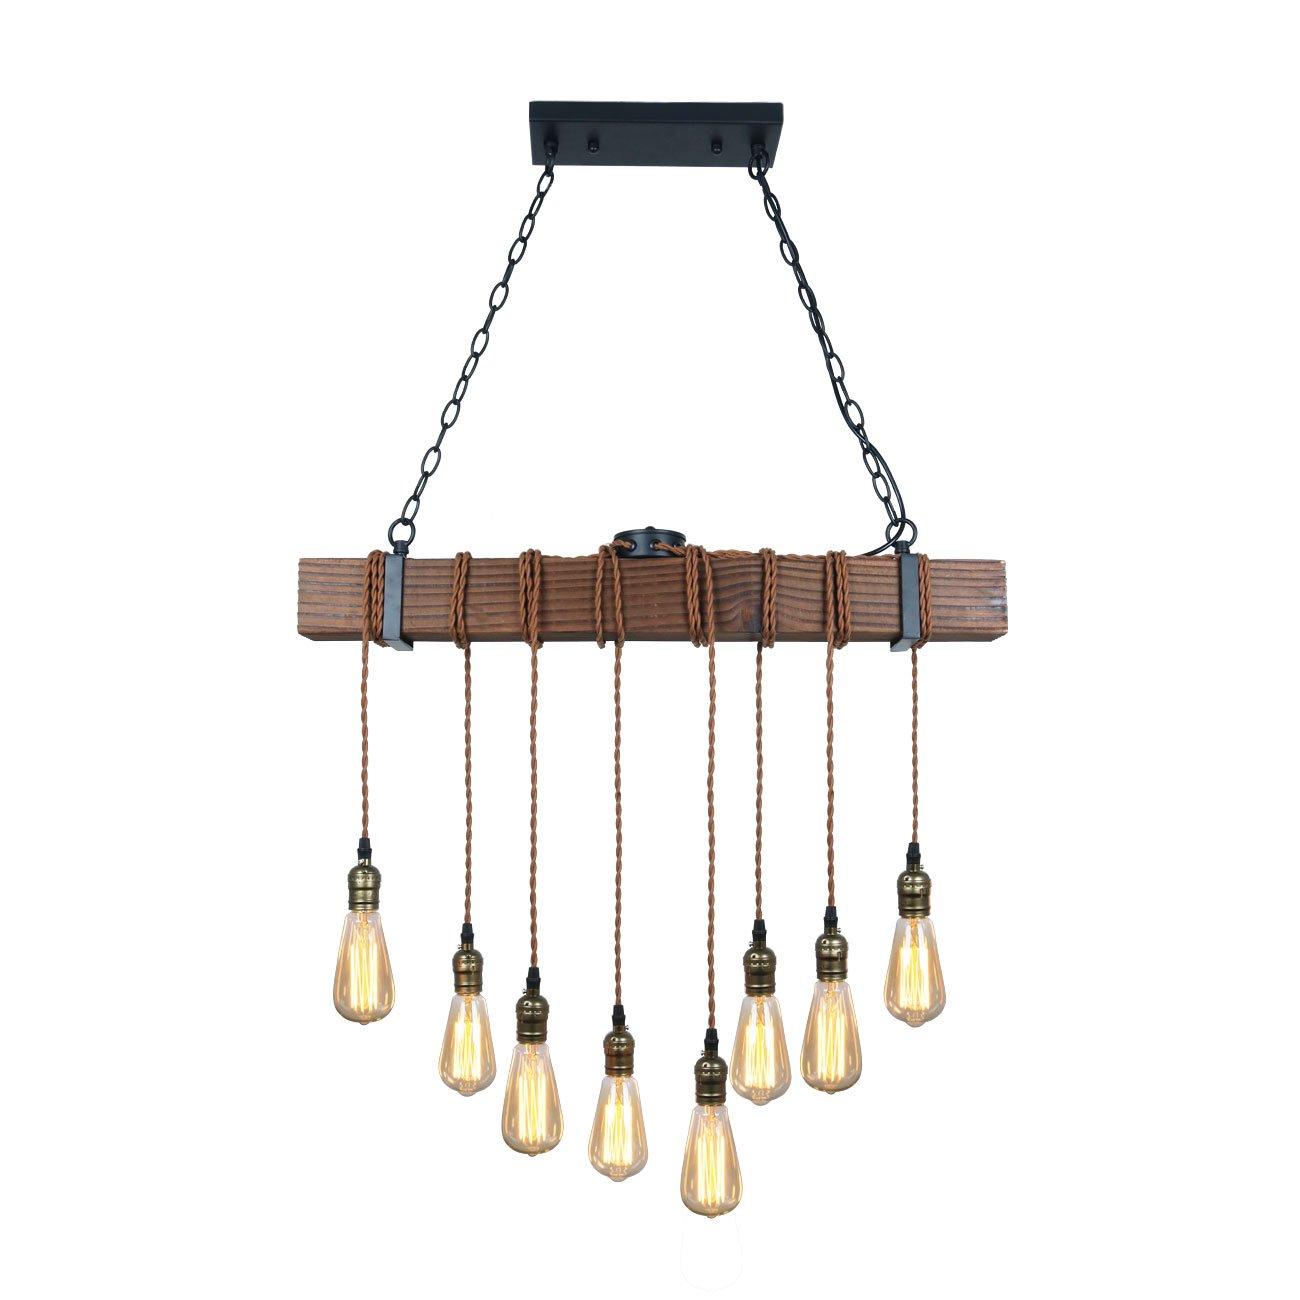 Unitary Brand Rustic Black Wood Hanging Multi Pendant Light with 8 E26 Bulb Sockets 320W Painted Finish